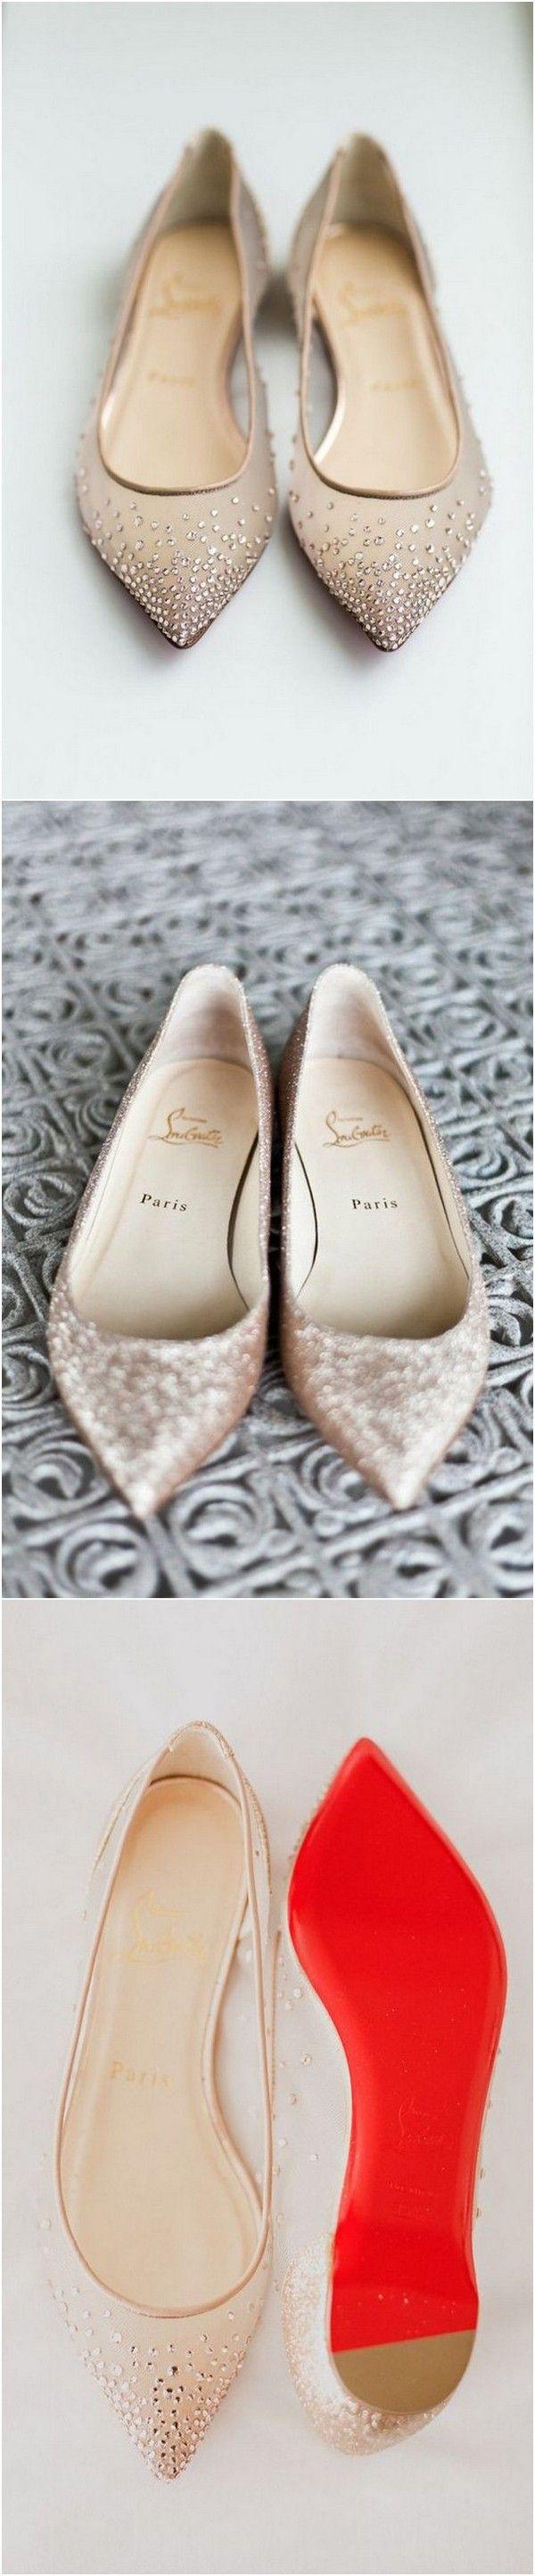 Christian Louboutin Elegant flat bridal wedding shoes  #wedding #weddingshoes #weddingflats